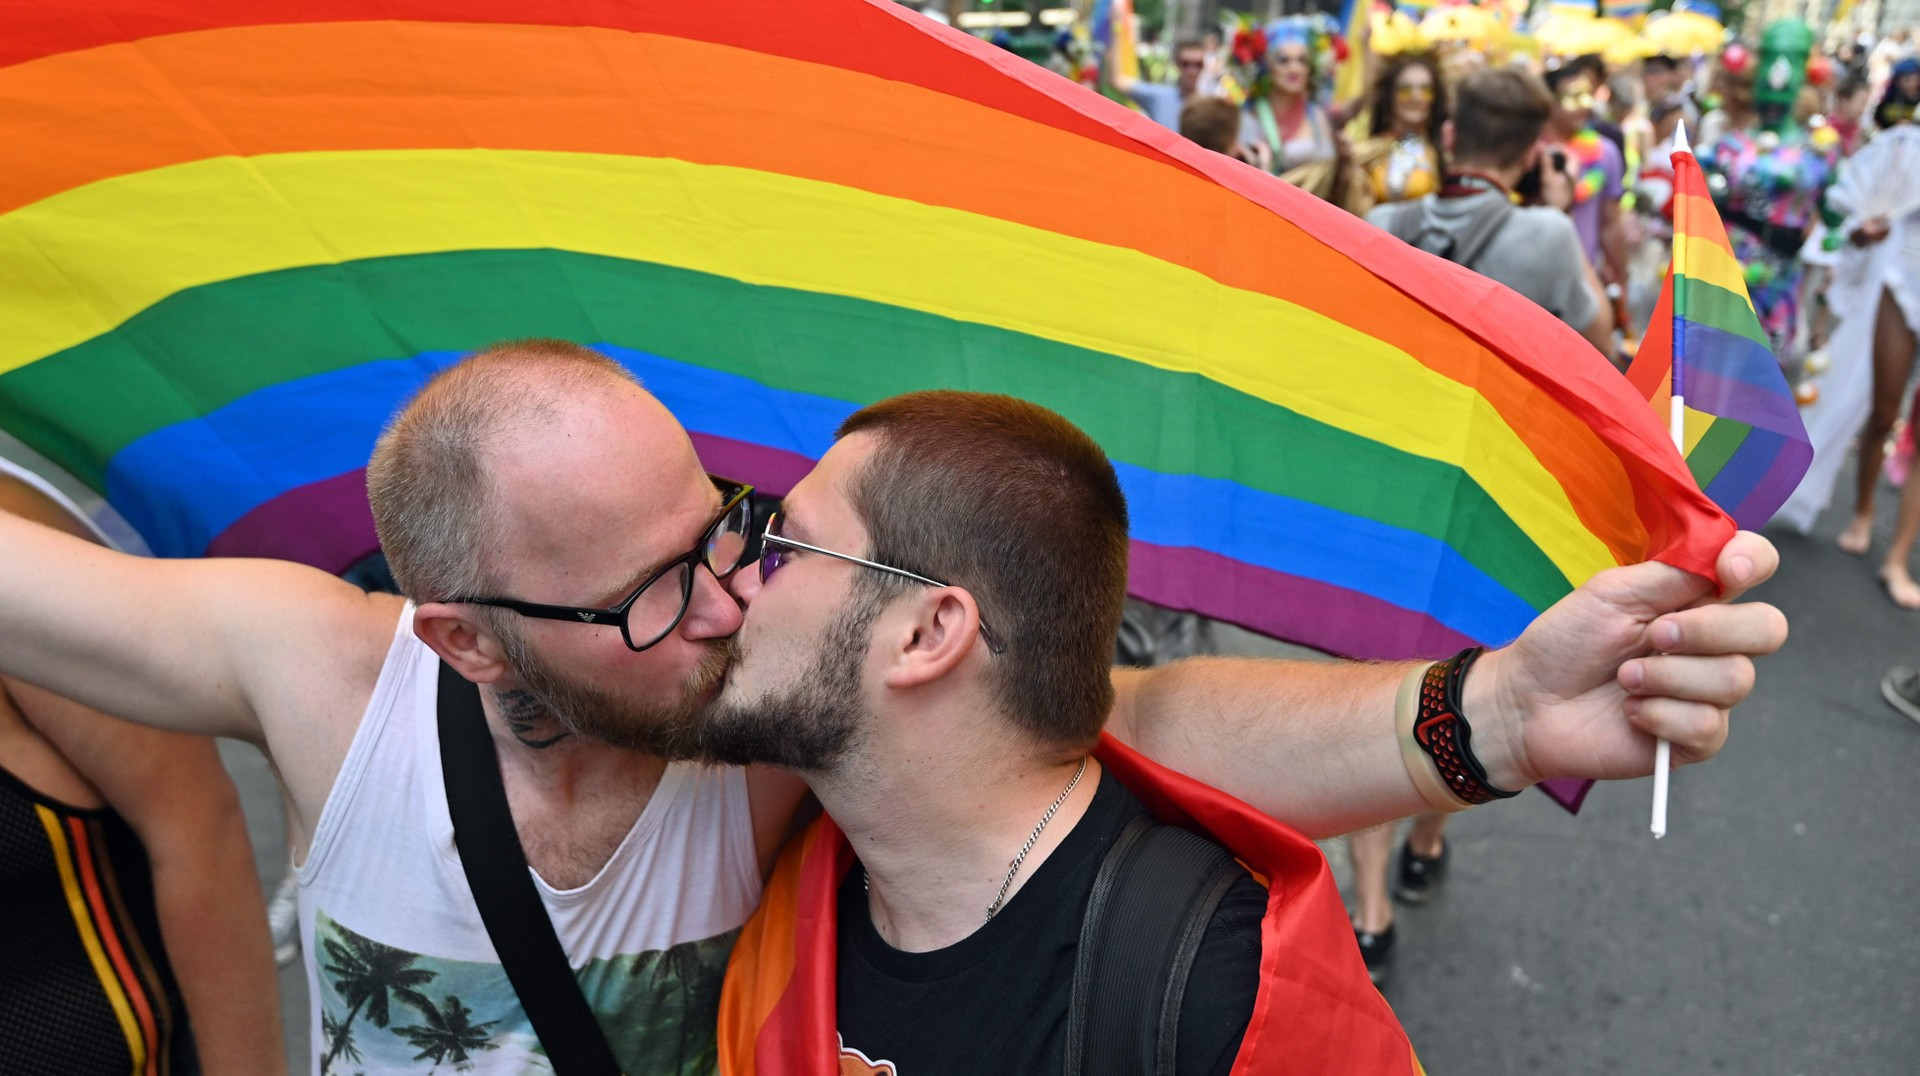 Gay colors images, stock photos vectors